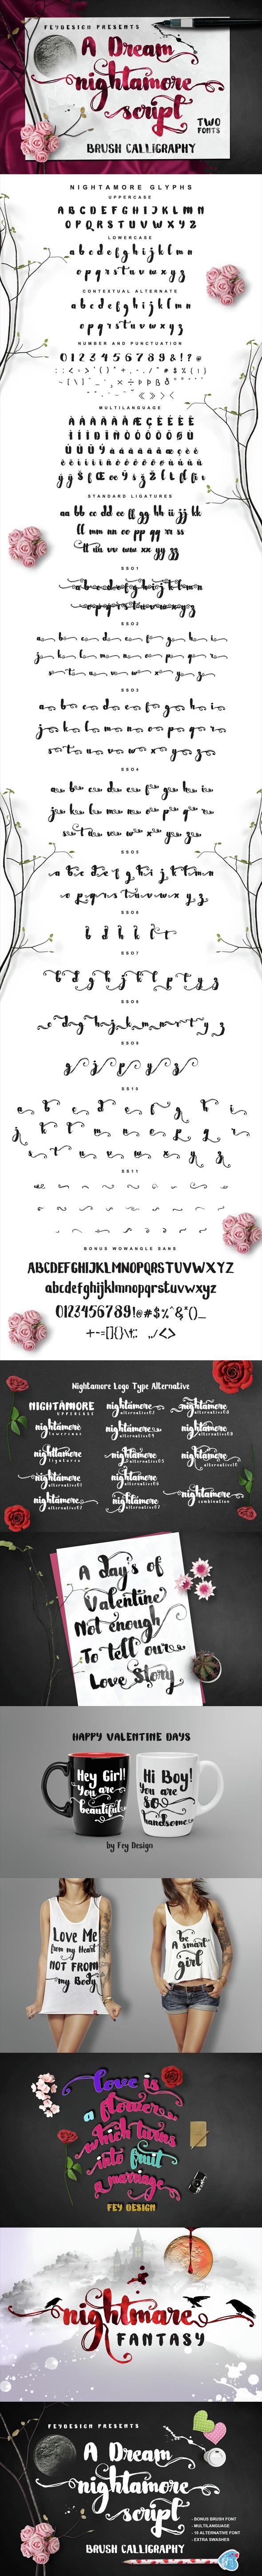 Free Font Nightamore Brush Calligraphy Download